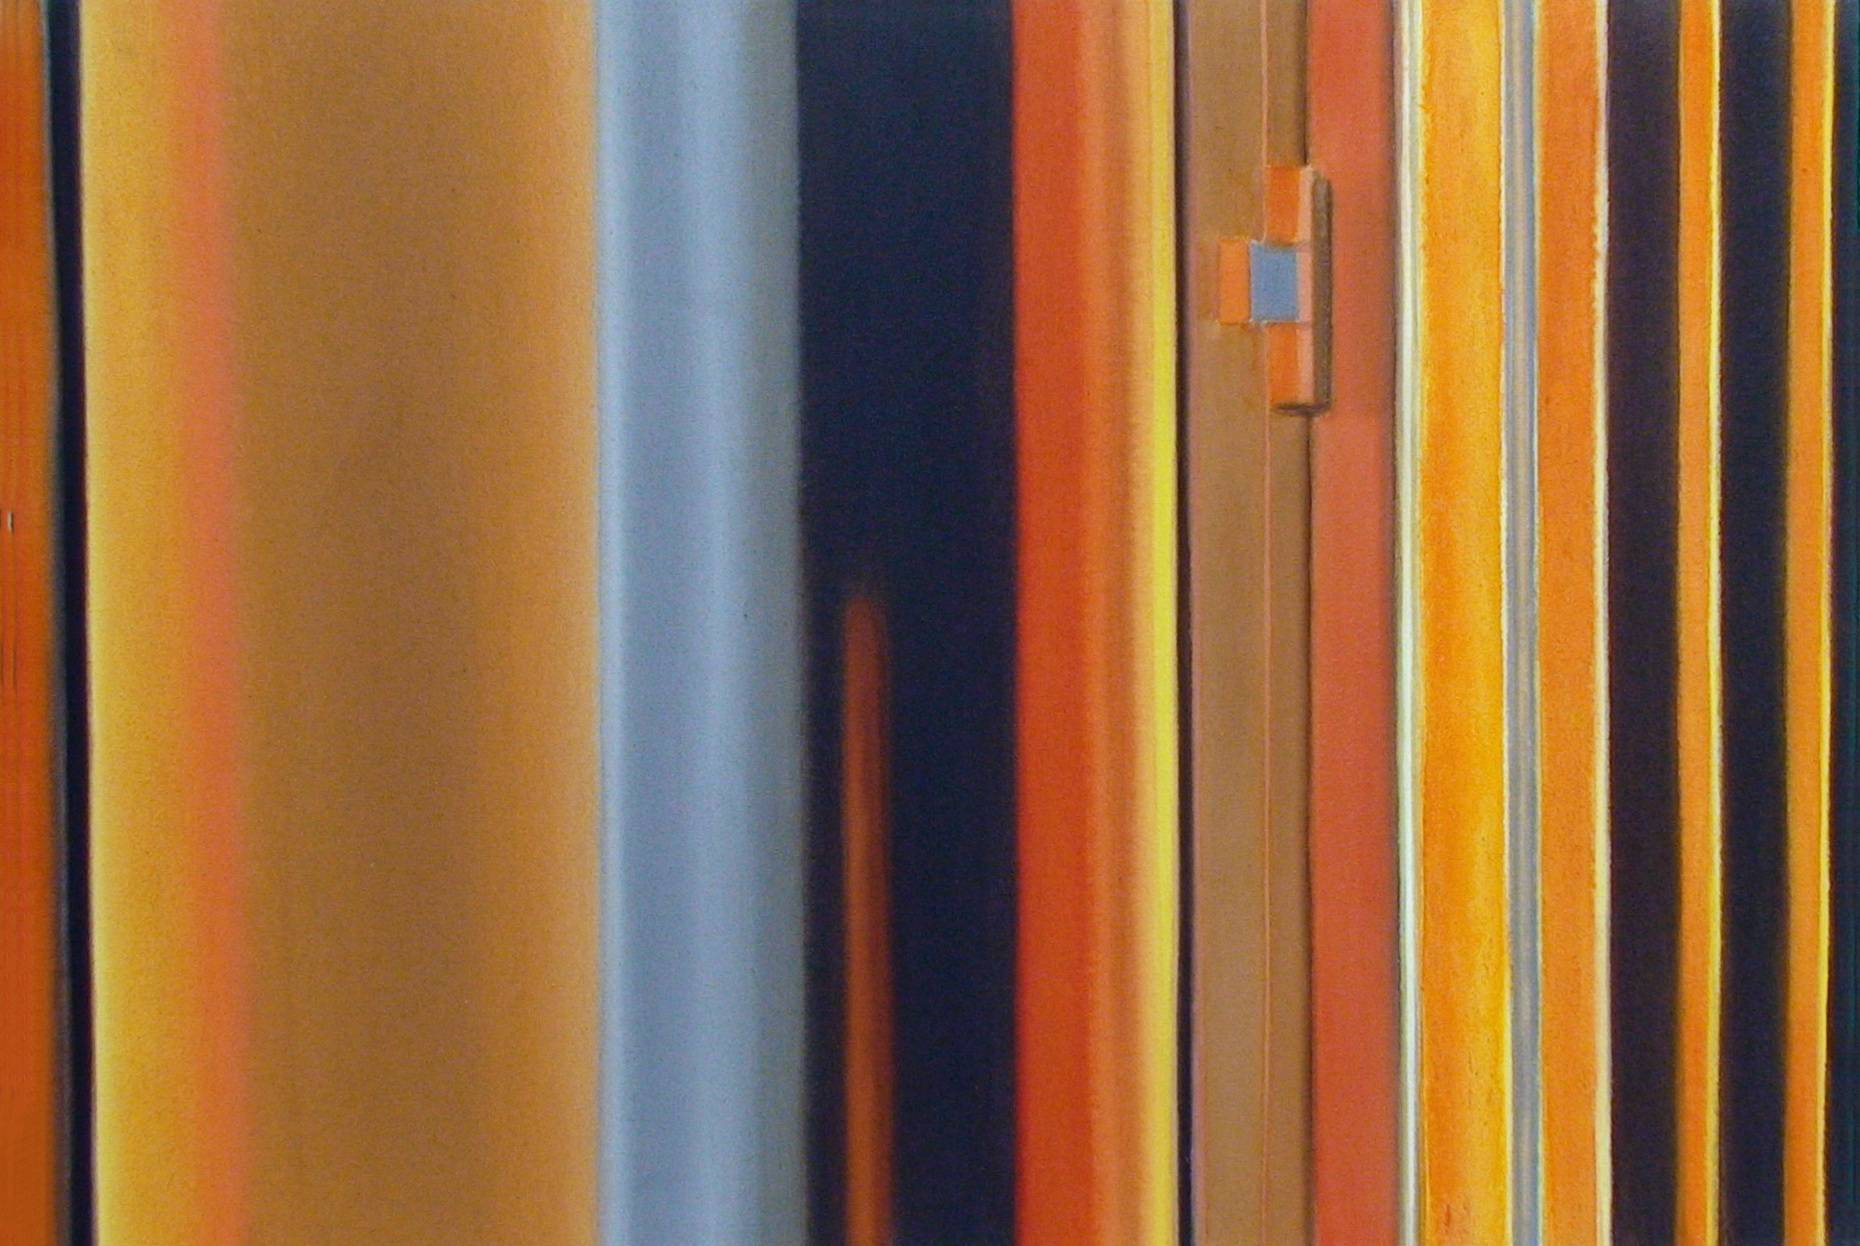 Raketenstation Hombroich 12 1997 Aquarell- u. Acrylfarbe a/Nessel 60 x 90 cm